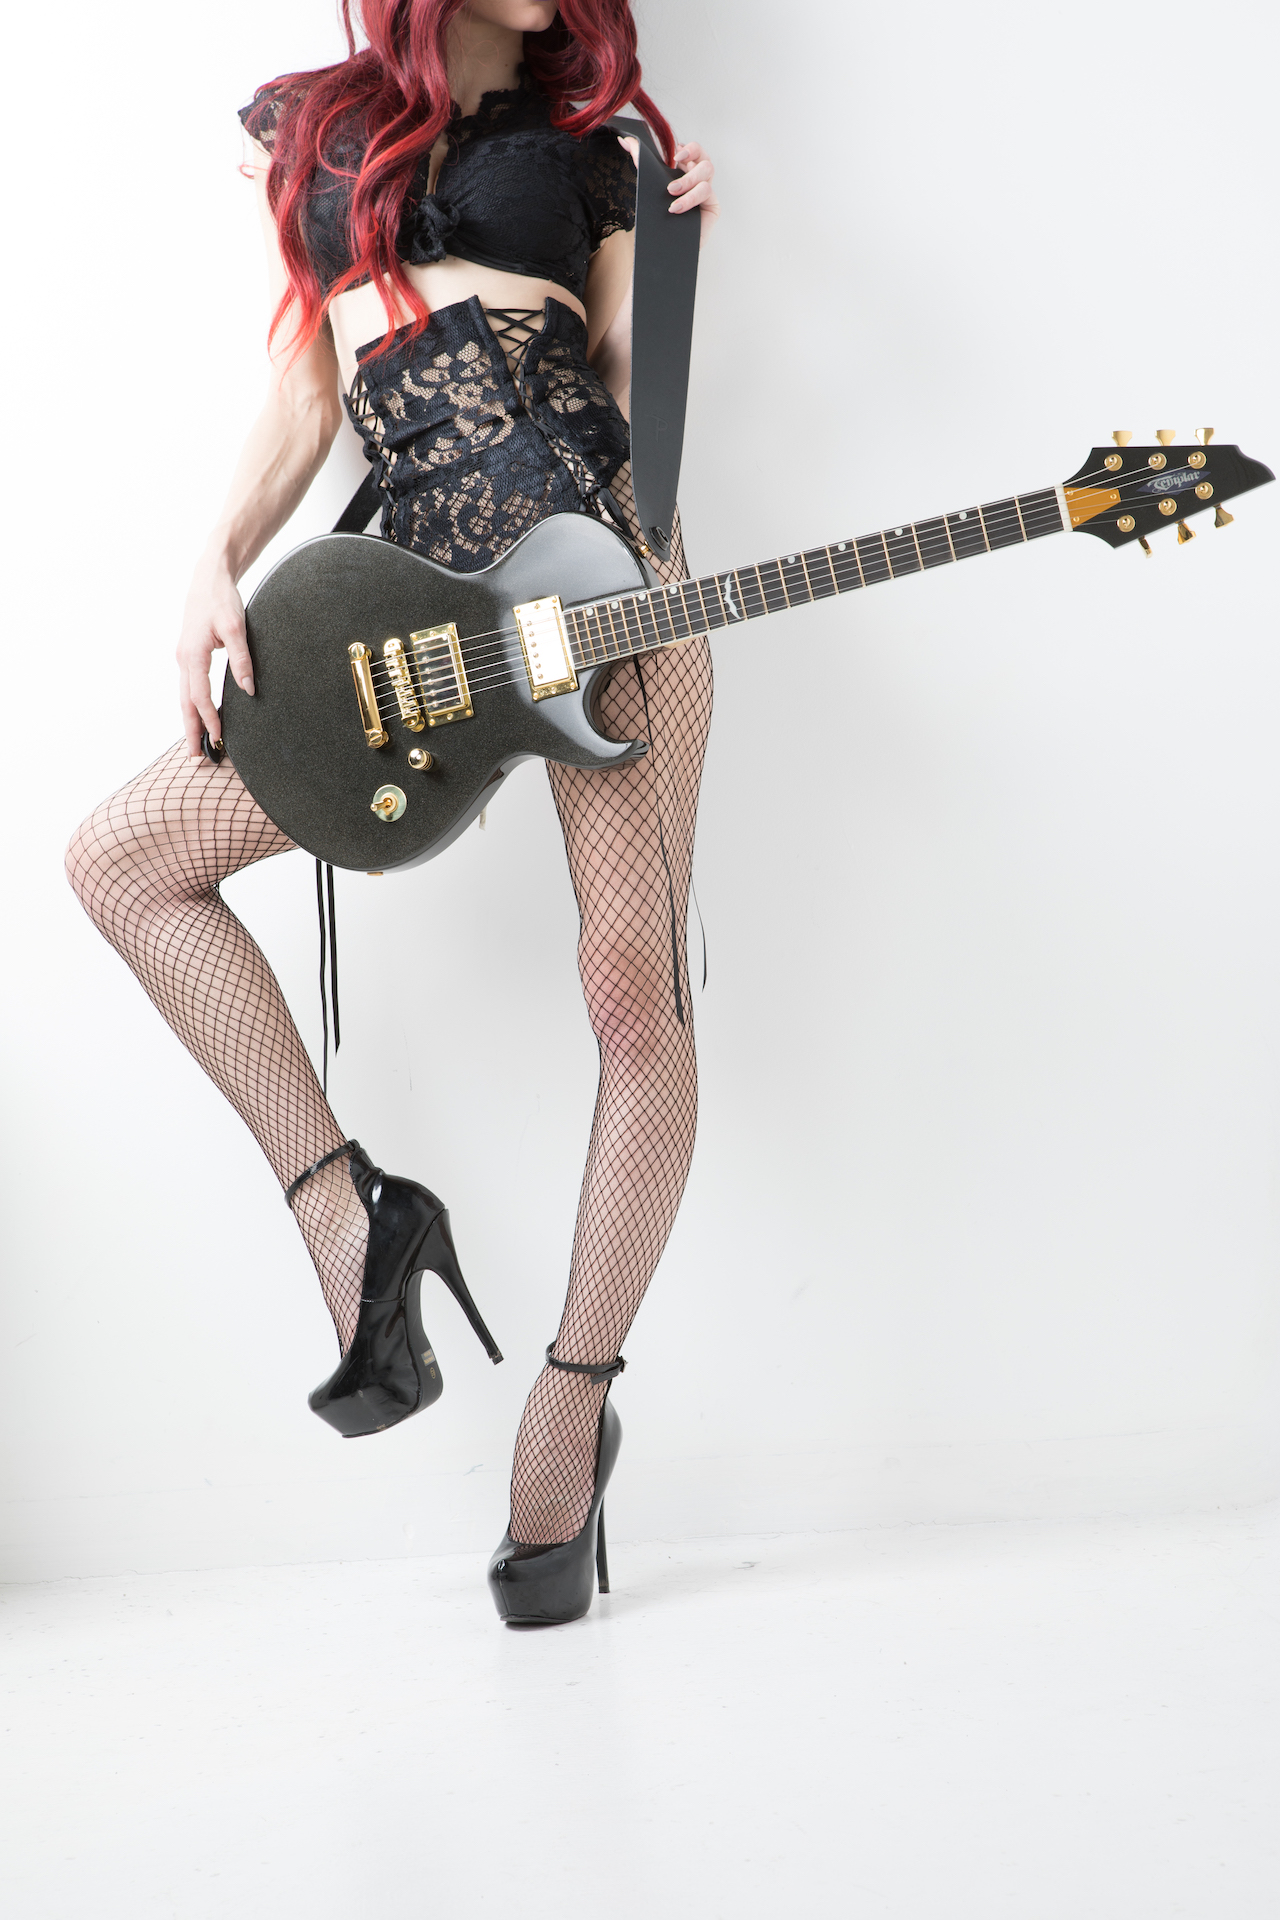 Guitar0217templar-lisa-tayler - IMGL0981.jpg